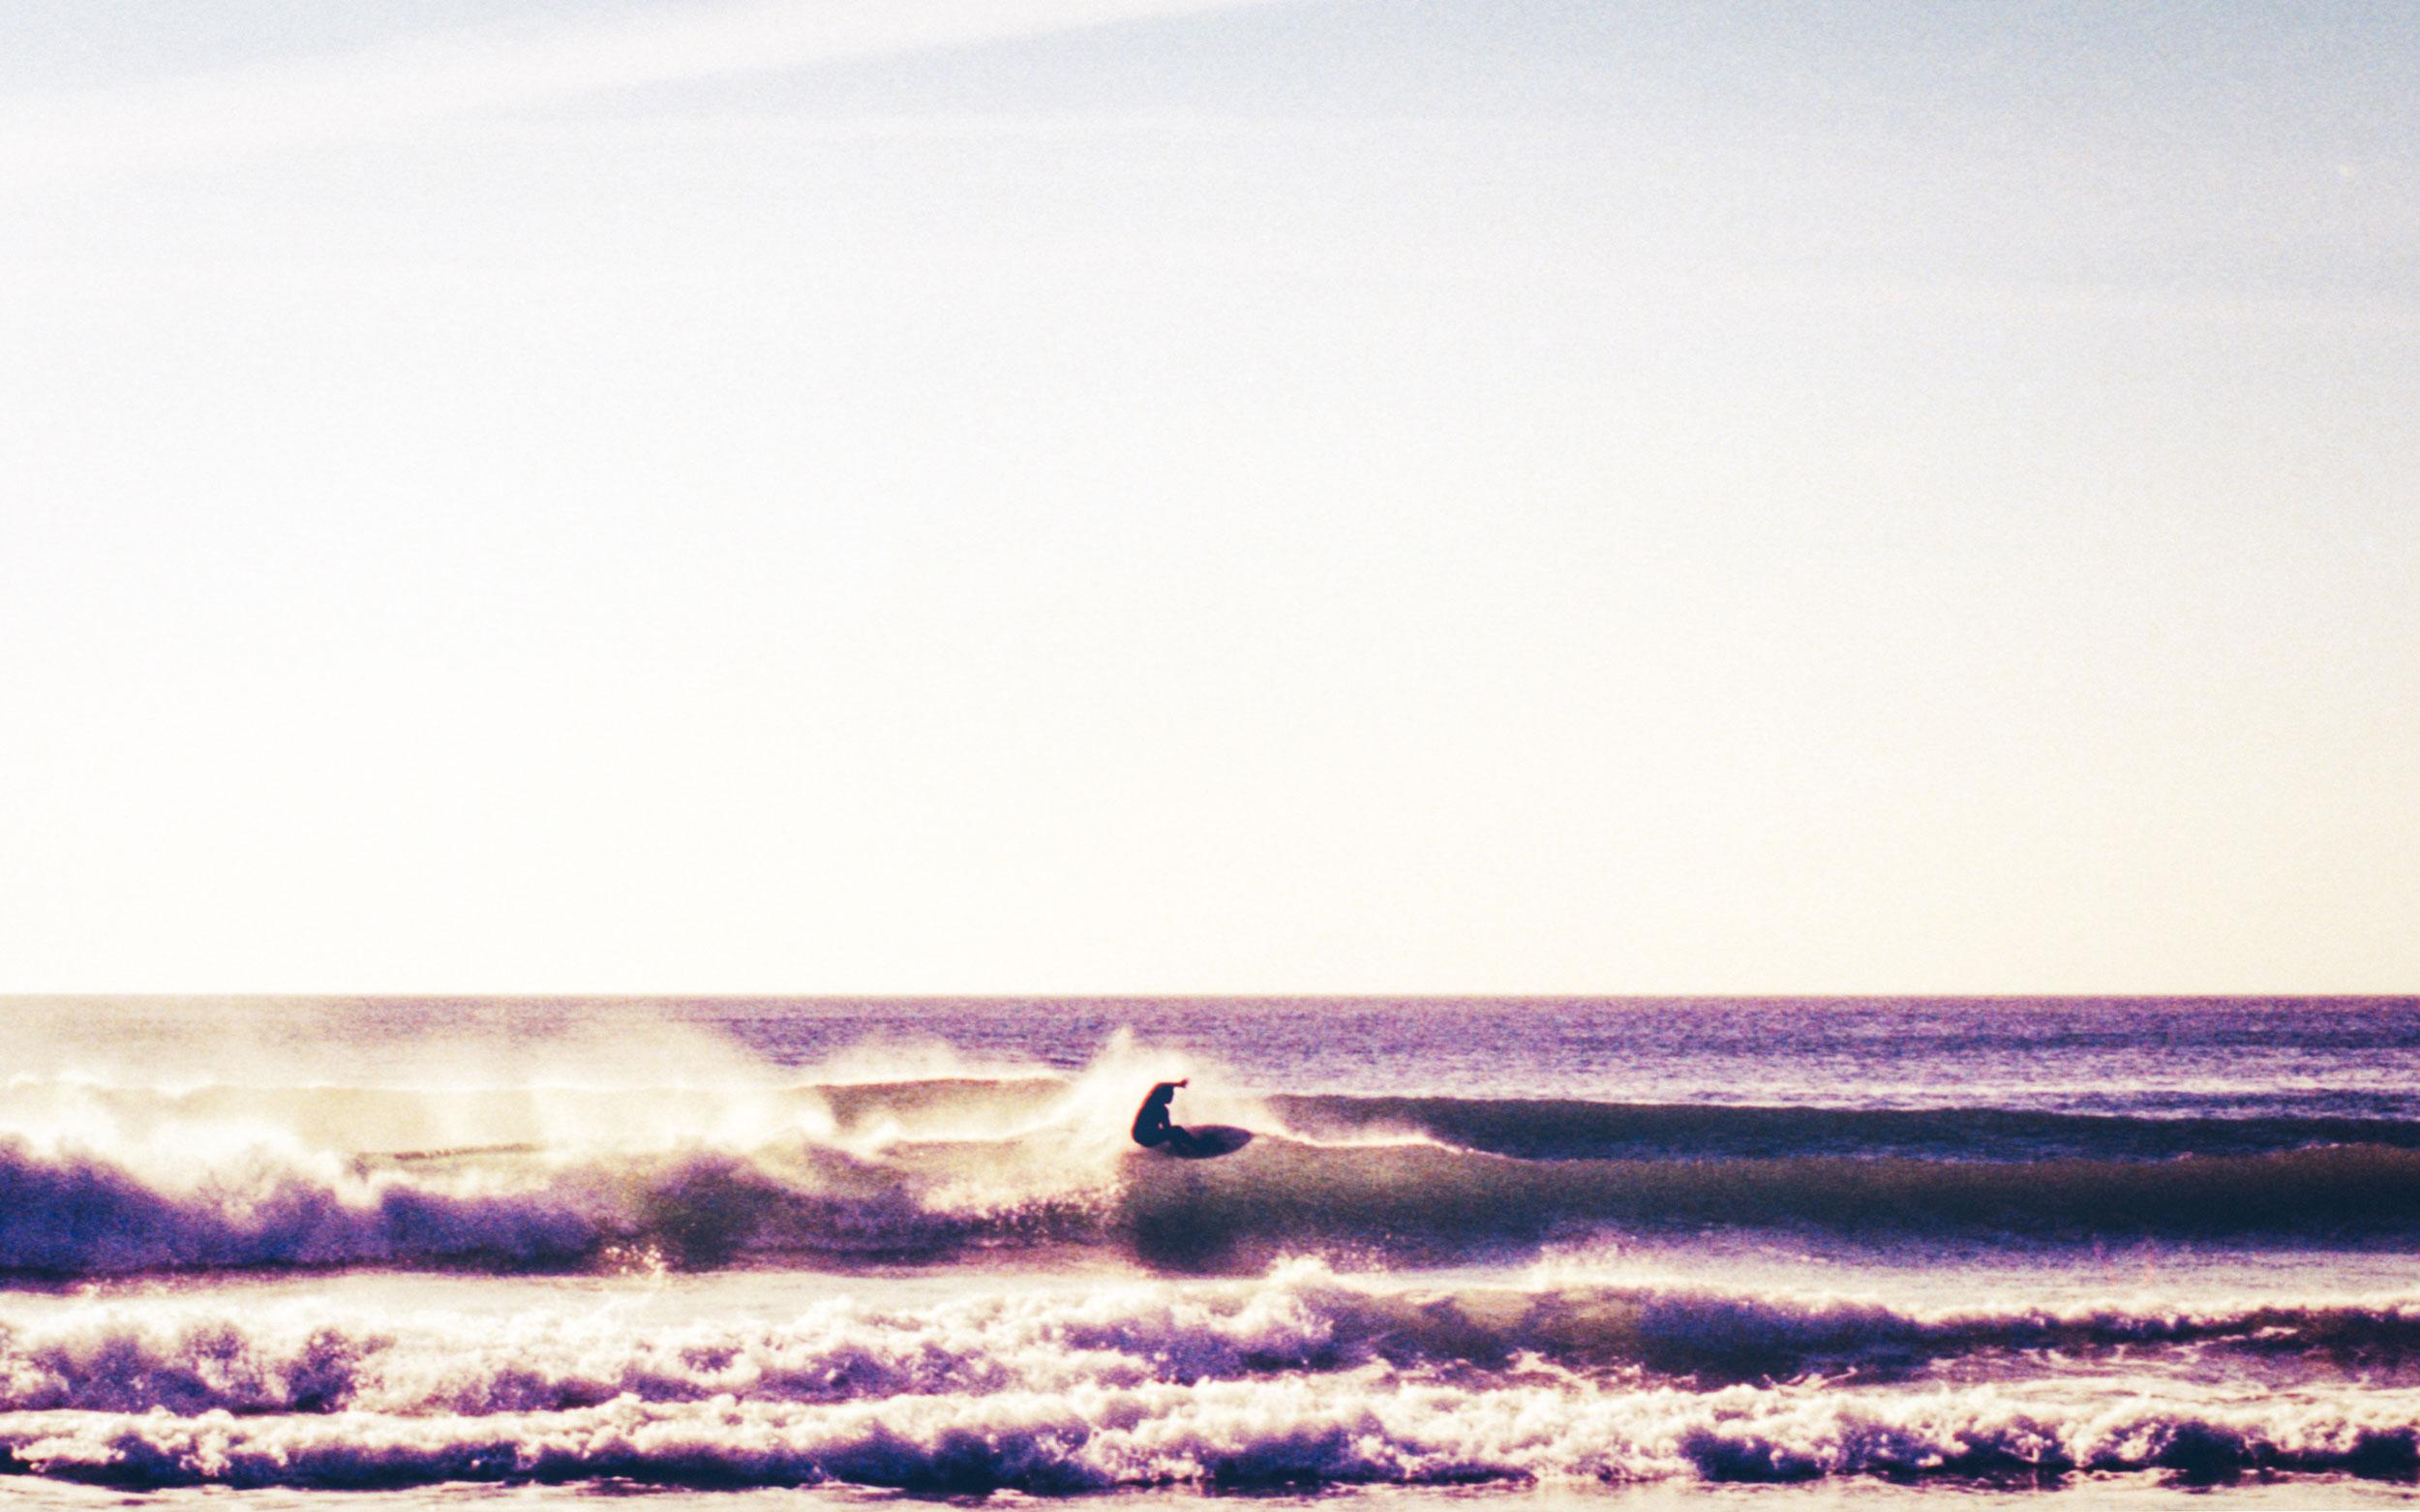 Surfer+getting+air+at+Fistral+Beach+_+Karl+Mackie+Photography.jpeg